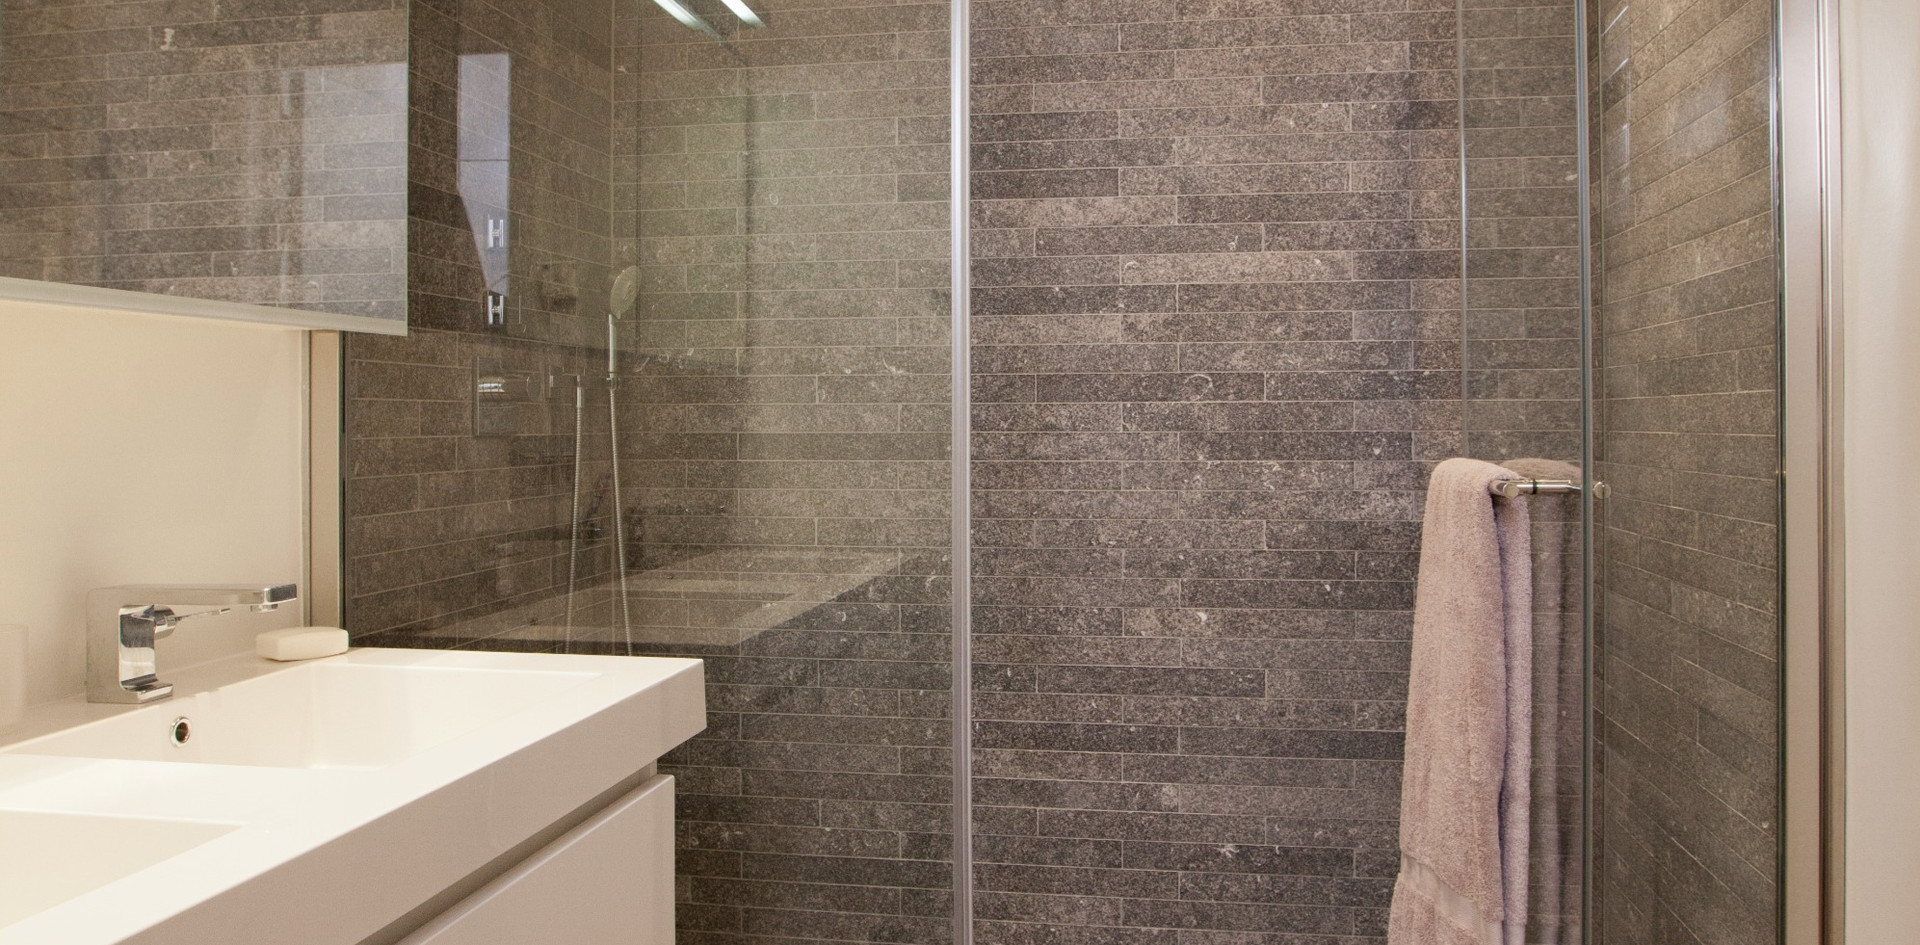 Badkamer grijze steentjes